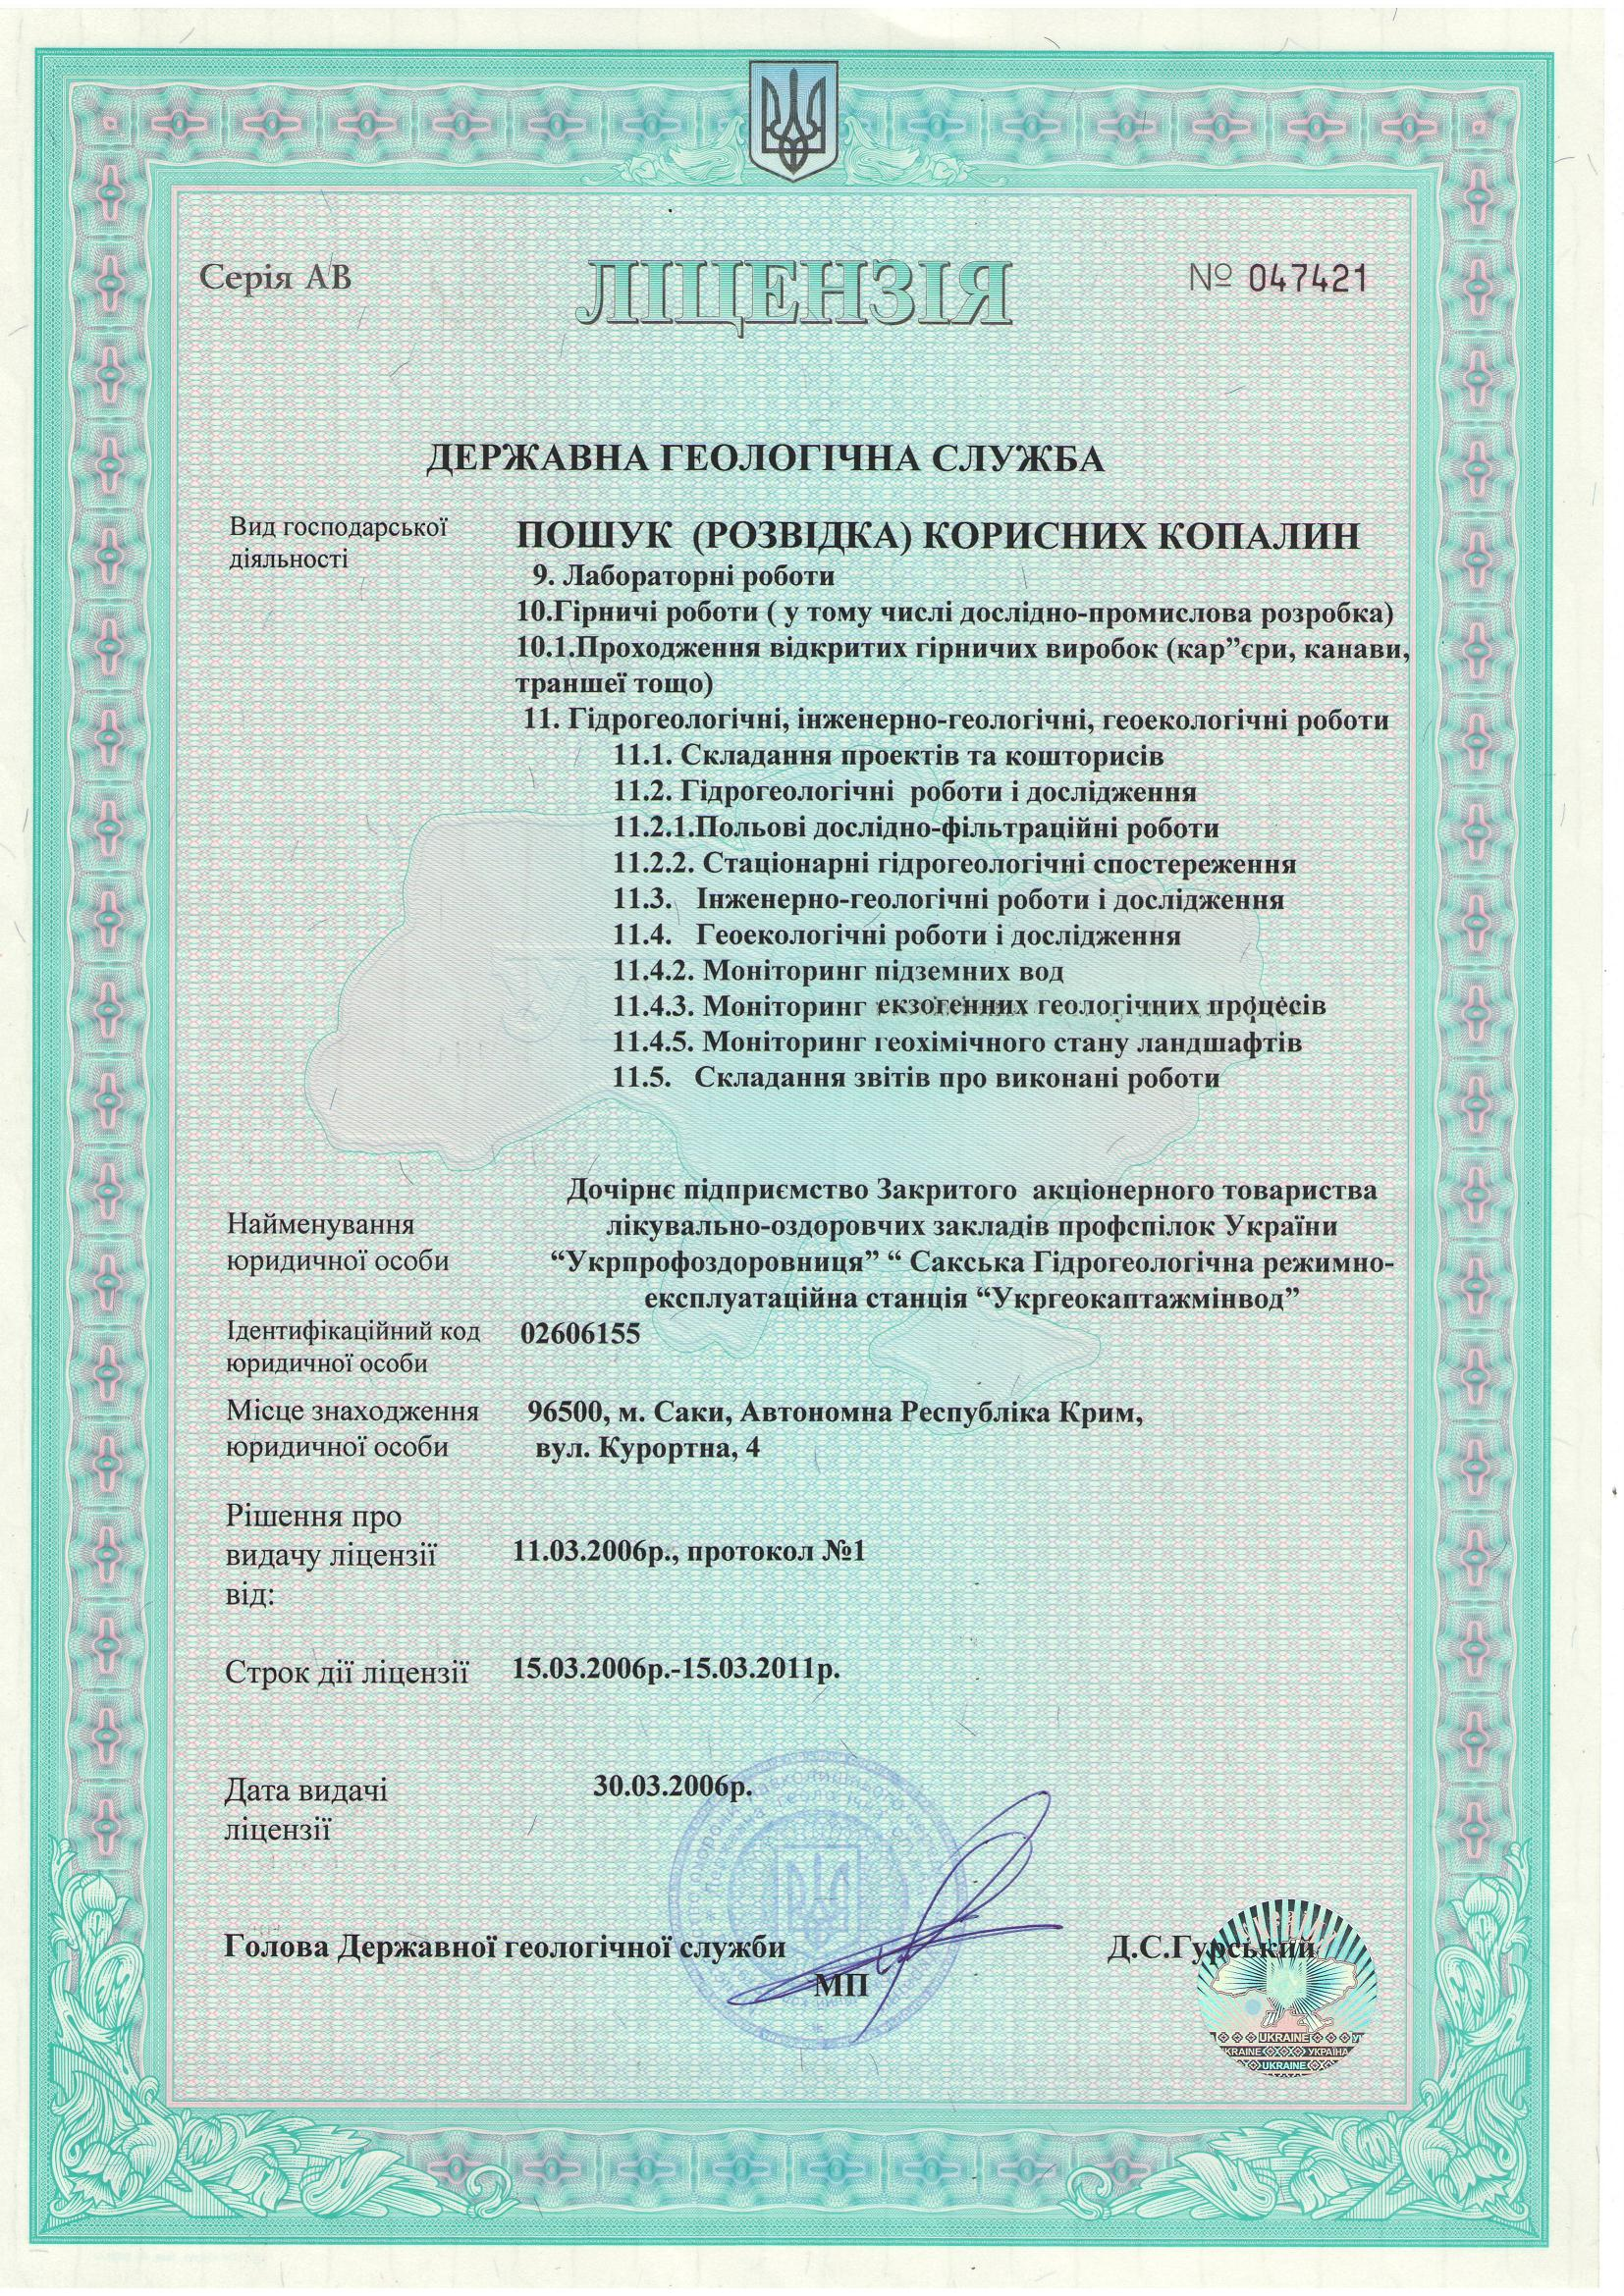 Лицензия АВ 047421